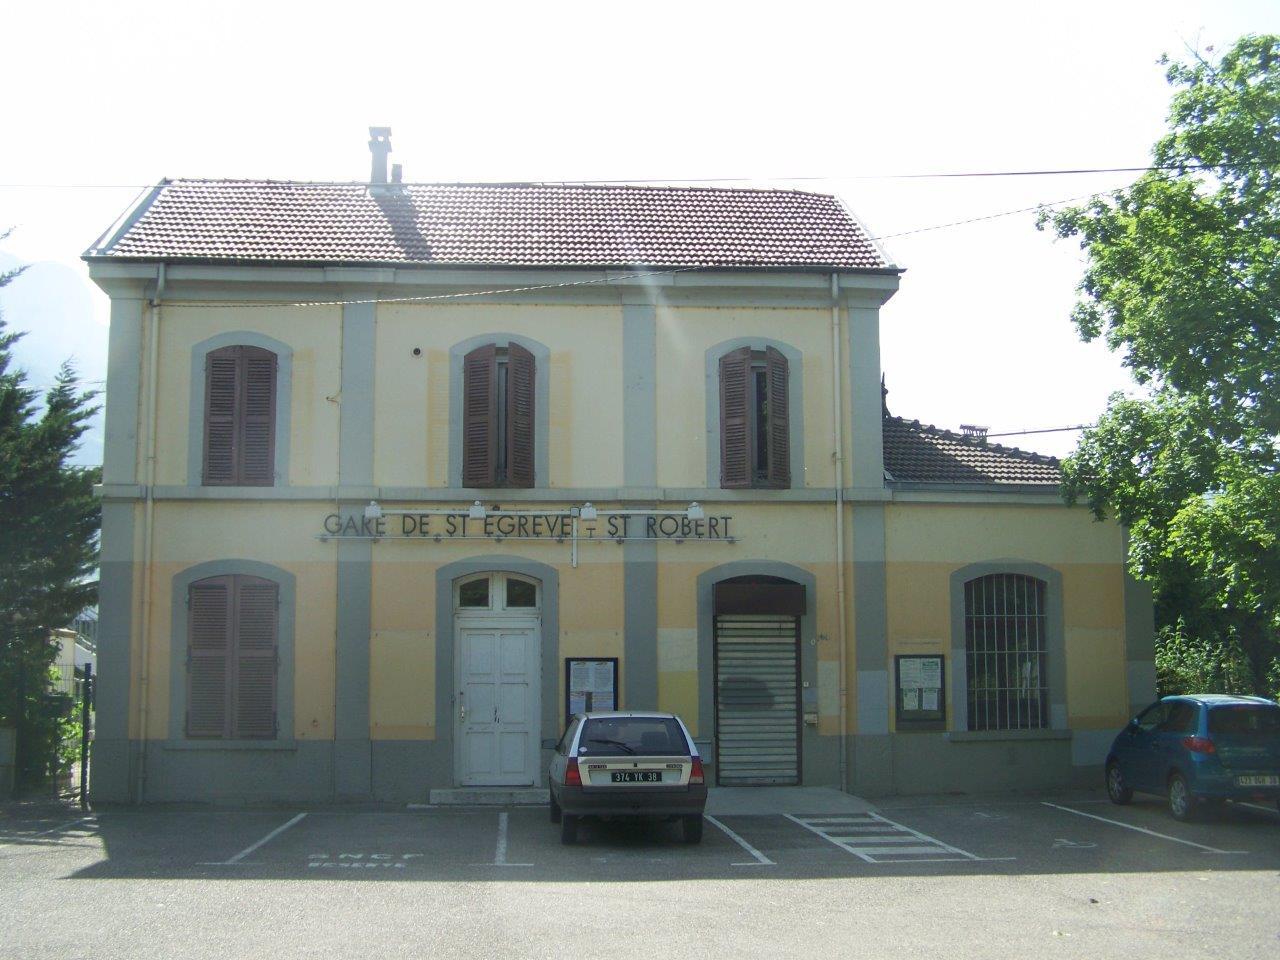 gare-de-saint-egreve-saint-robert-train-station